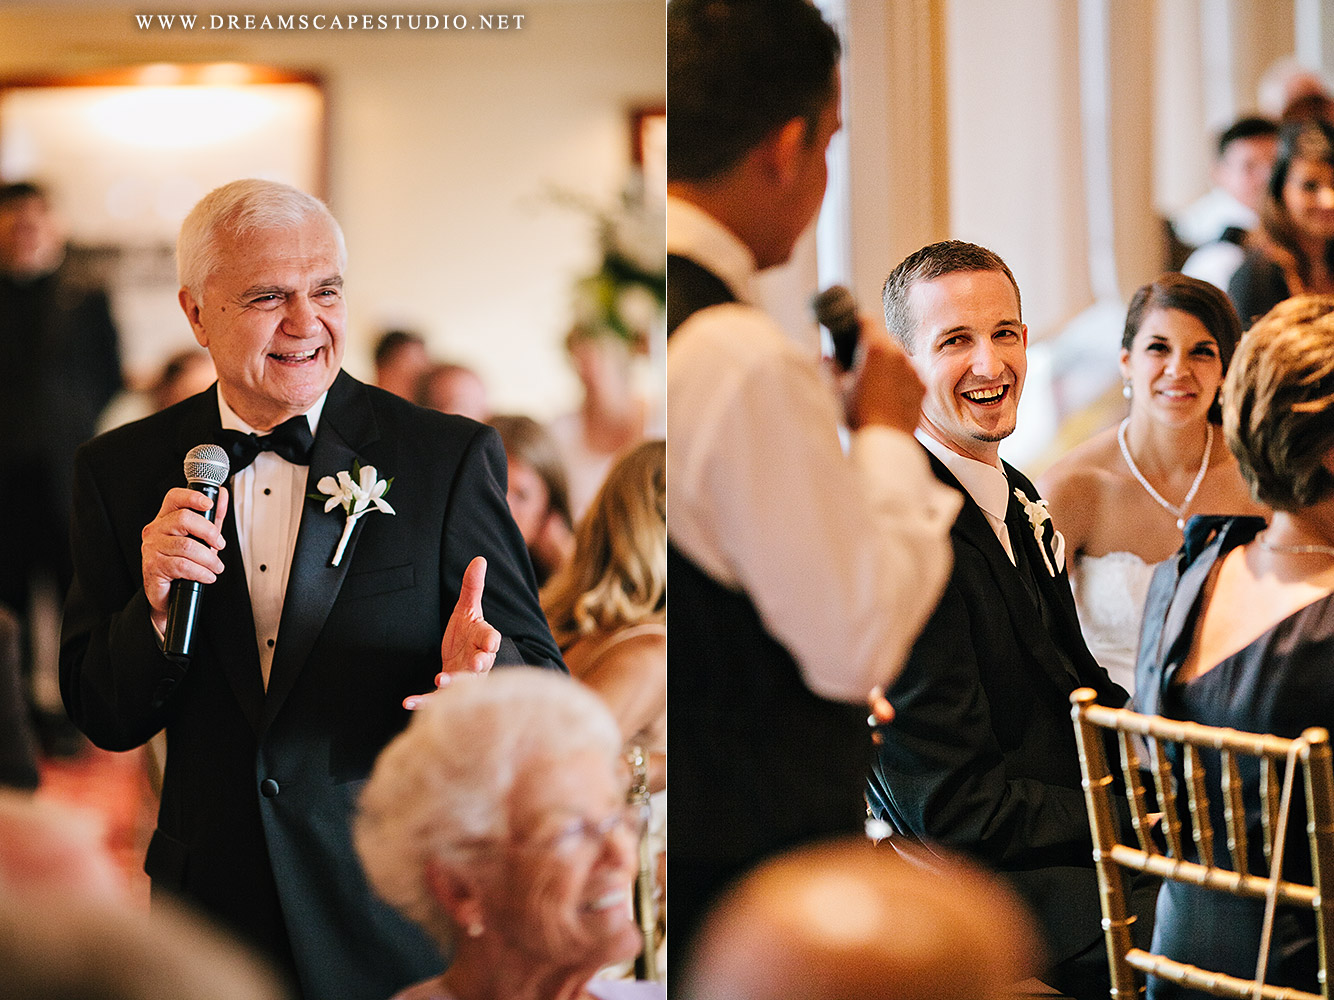 CT_Wedding_Photography_Liz_Justin_22LiJu.jpg